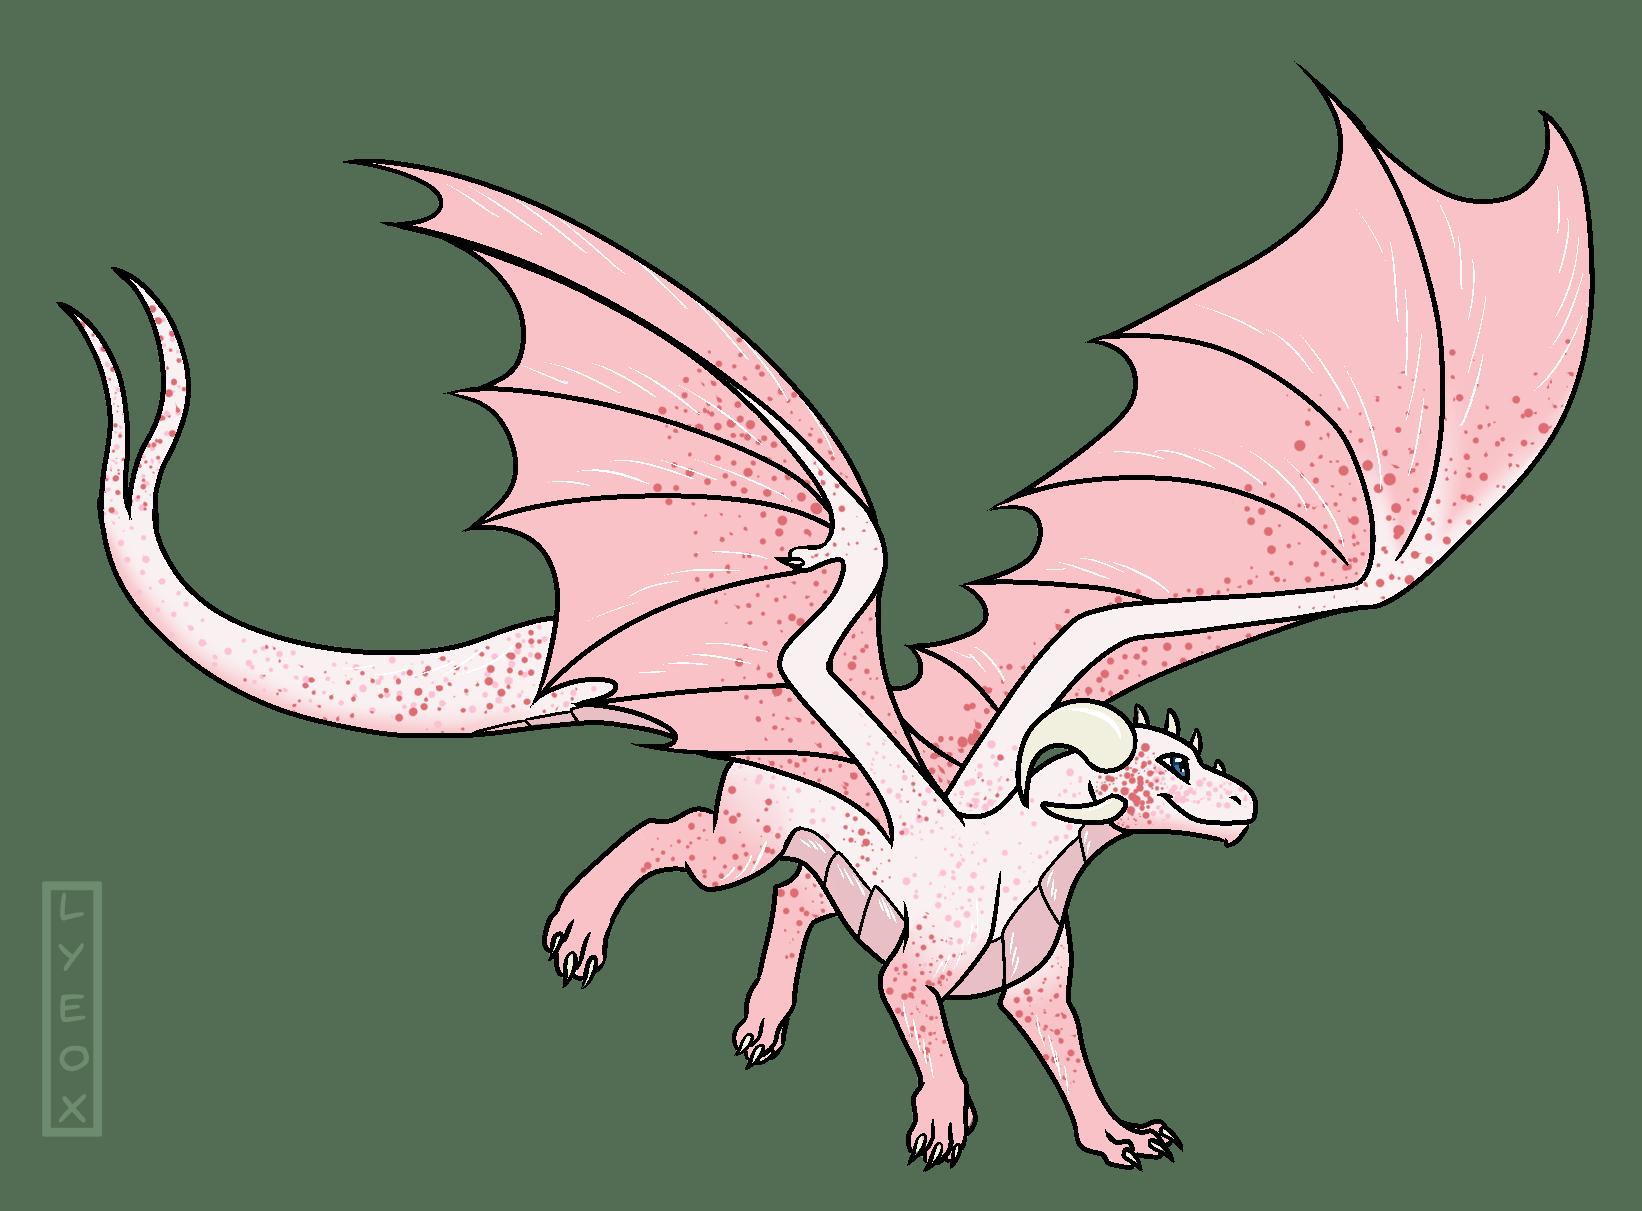 Piveth! [Commission]